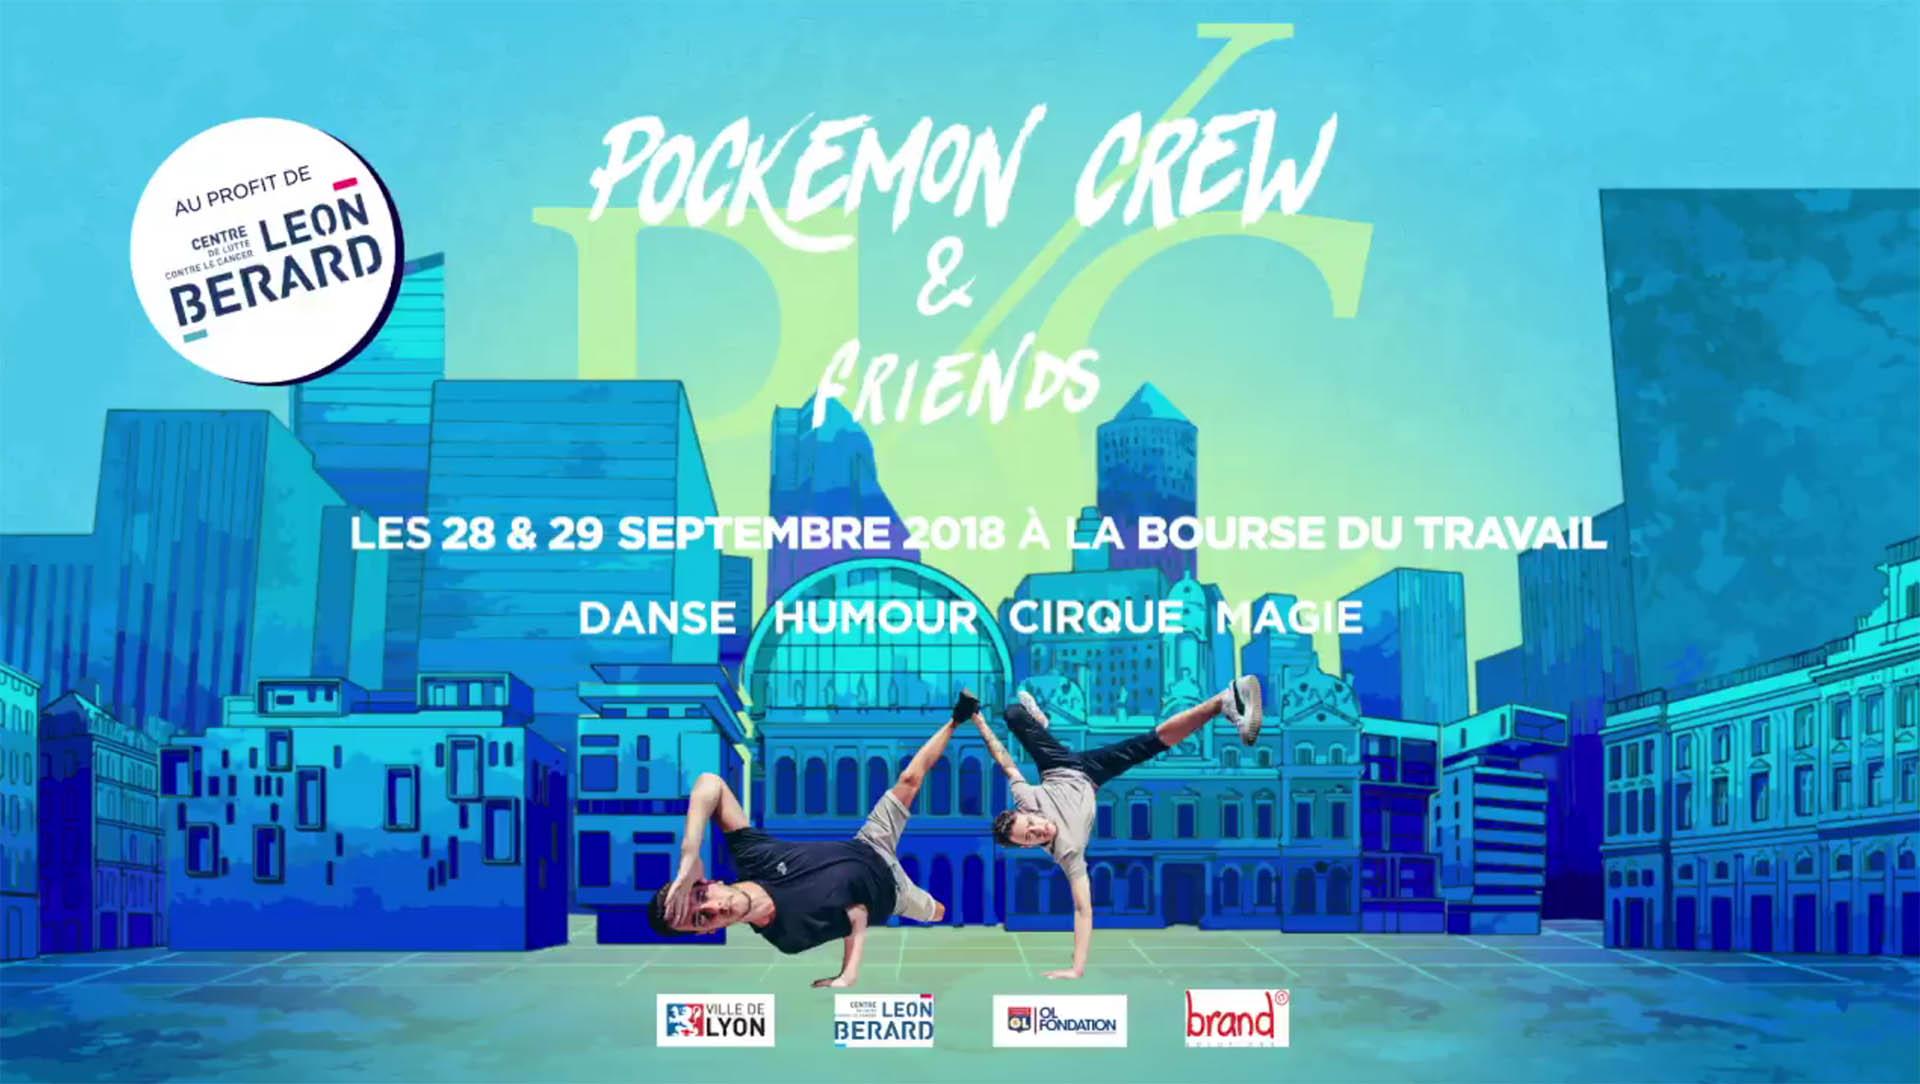 Pockemon-Crew-Friends-28-septembre-2018